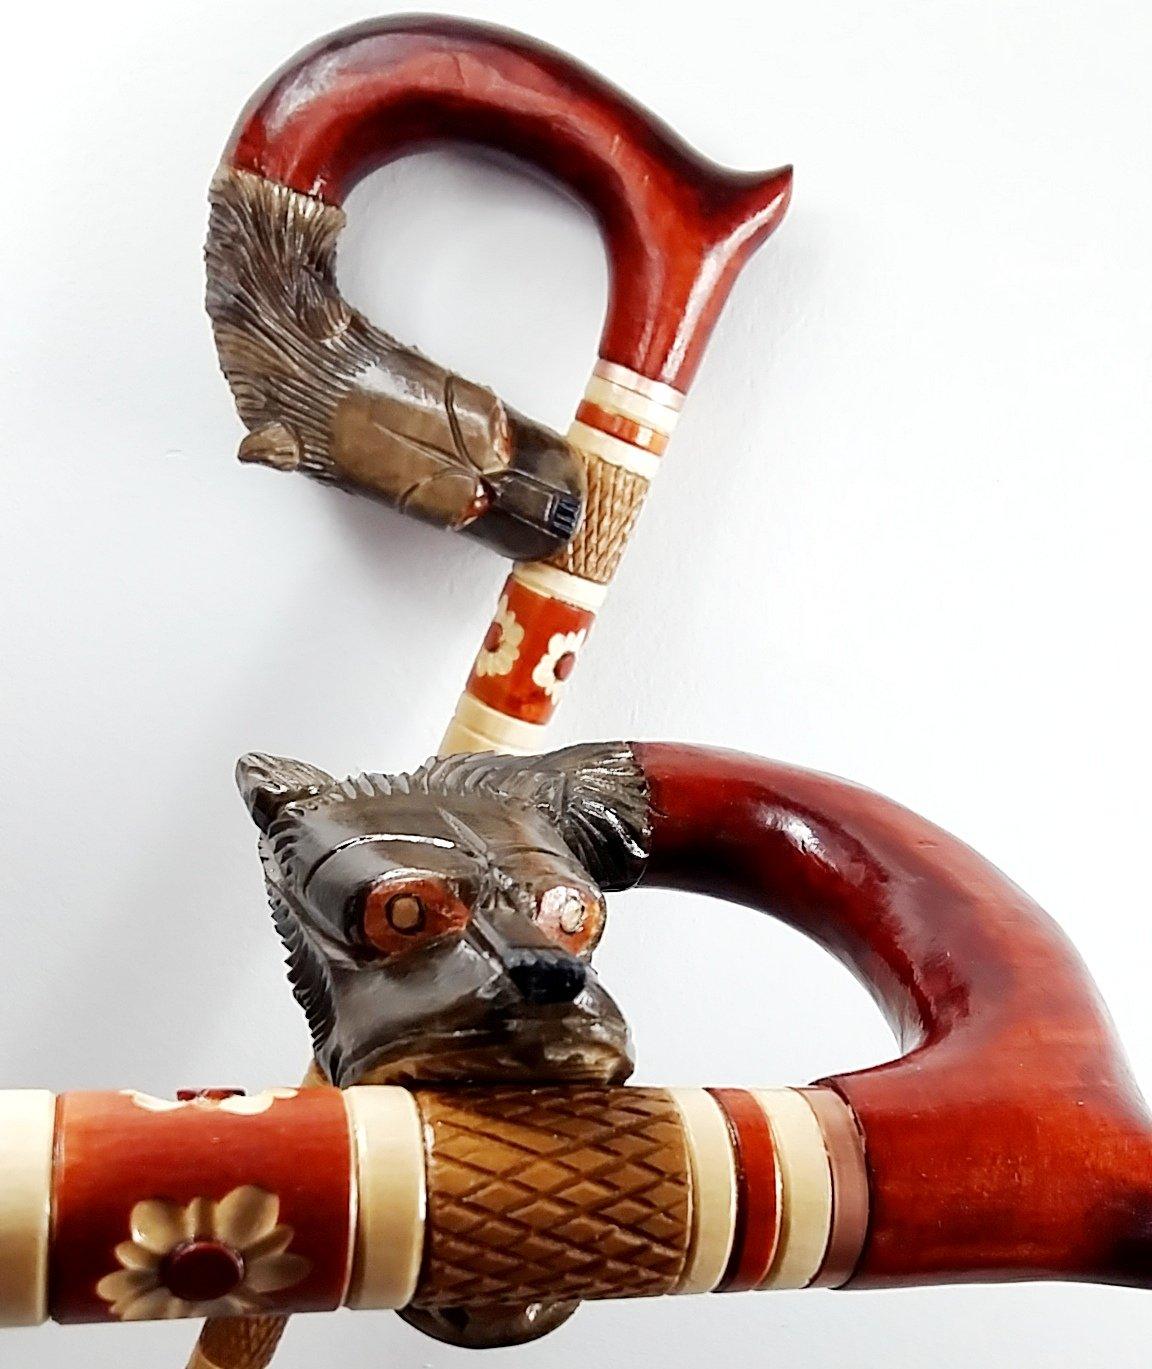 Cane Walking Stick Wooden Stick Handmade Men's Accesories (34 inch, Cobra)